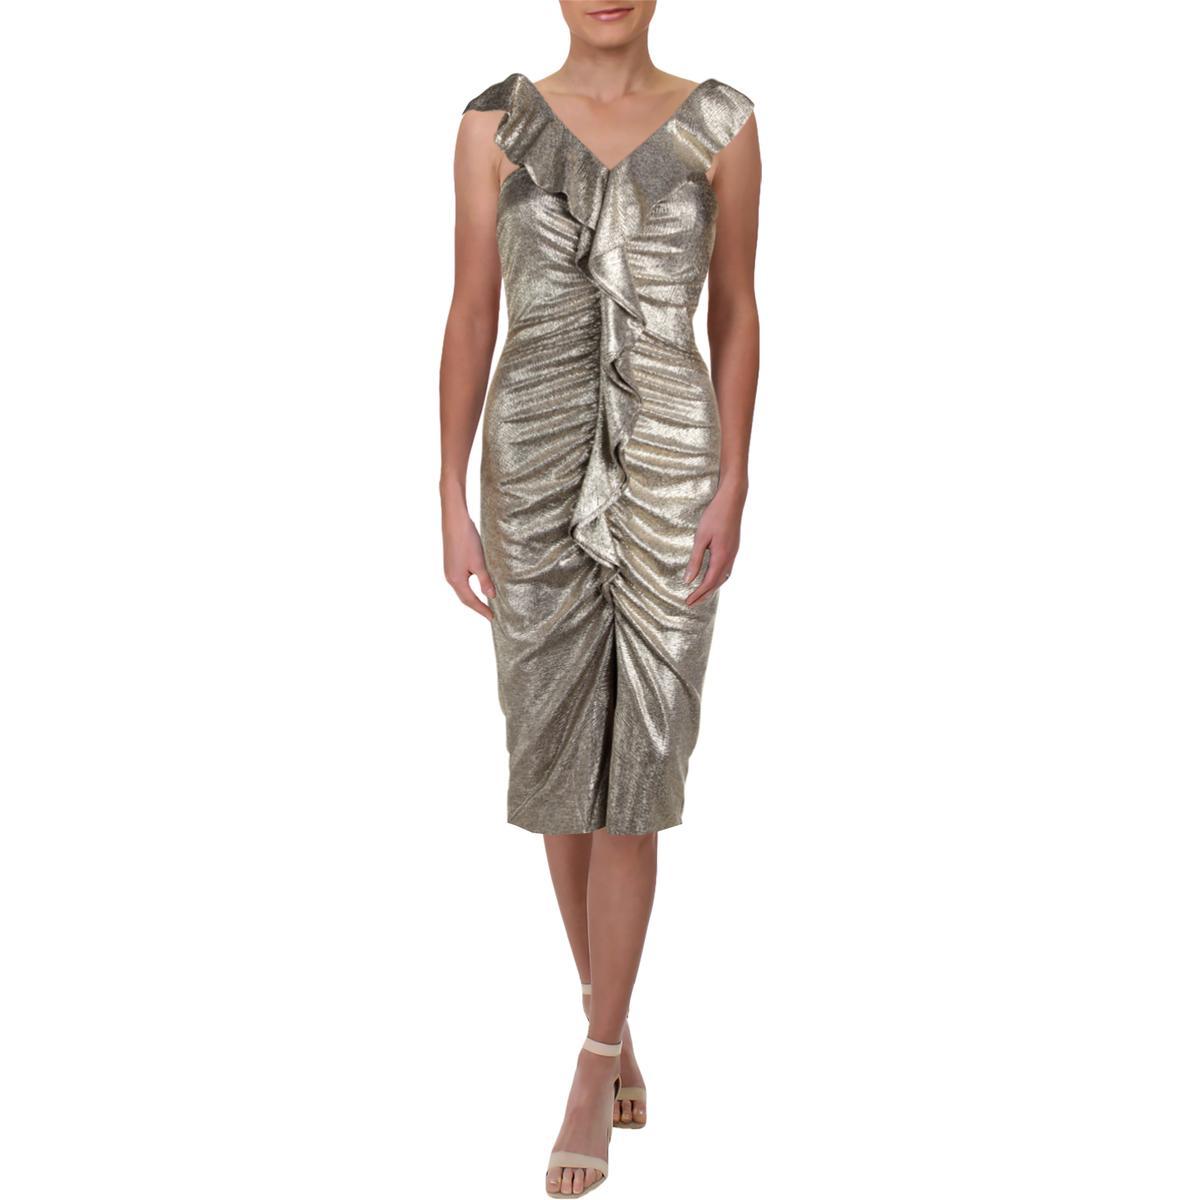 708d5110 Details about Gianni Bini Womens Jody Metallic Midi Party Cocktail Dress  BHFO 5826